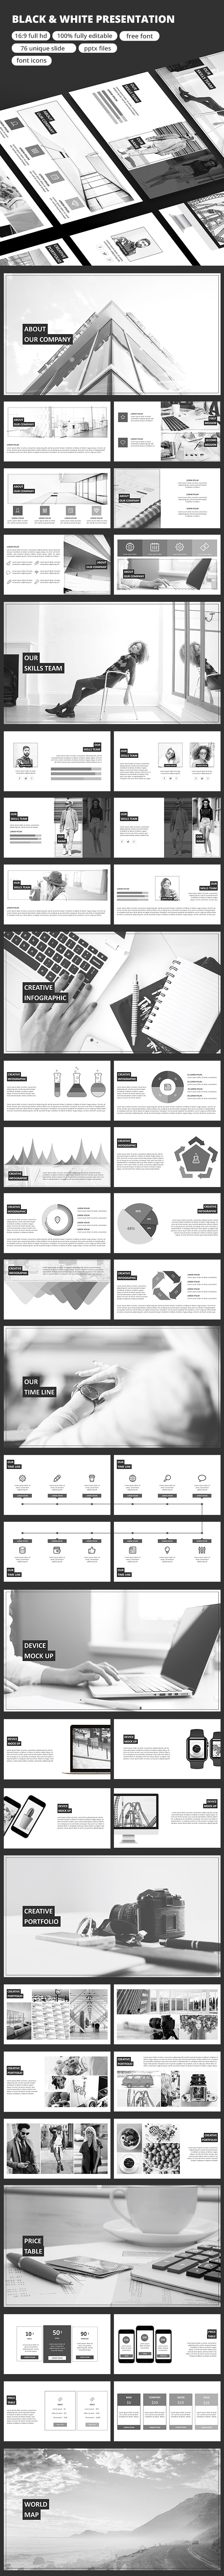 Black & White - Google Slide - Google Slides Presentation Templates